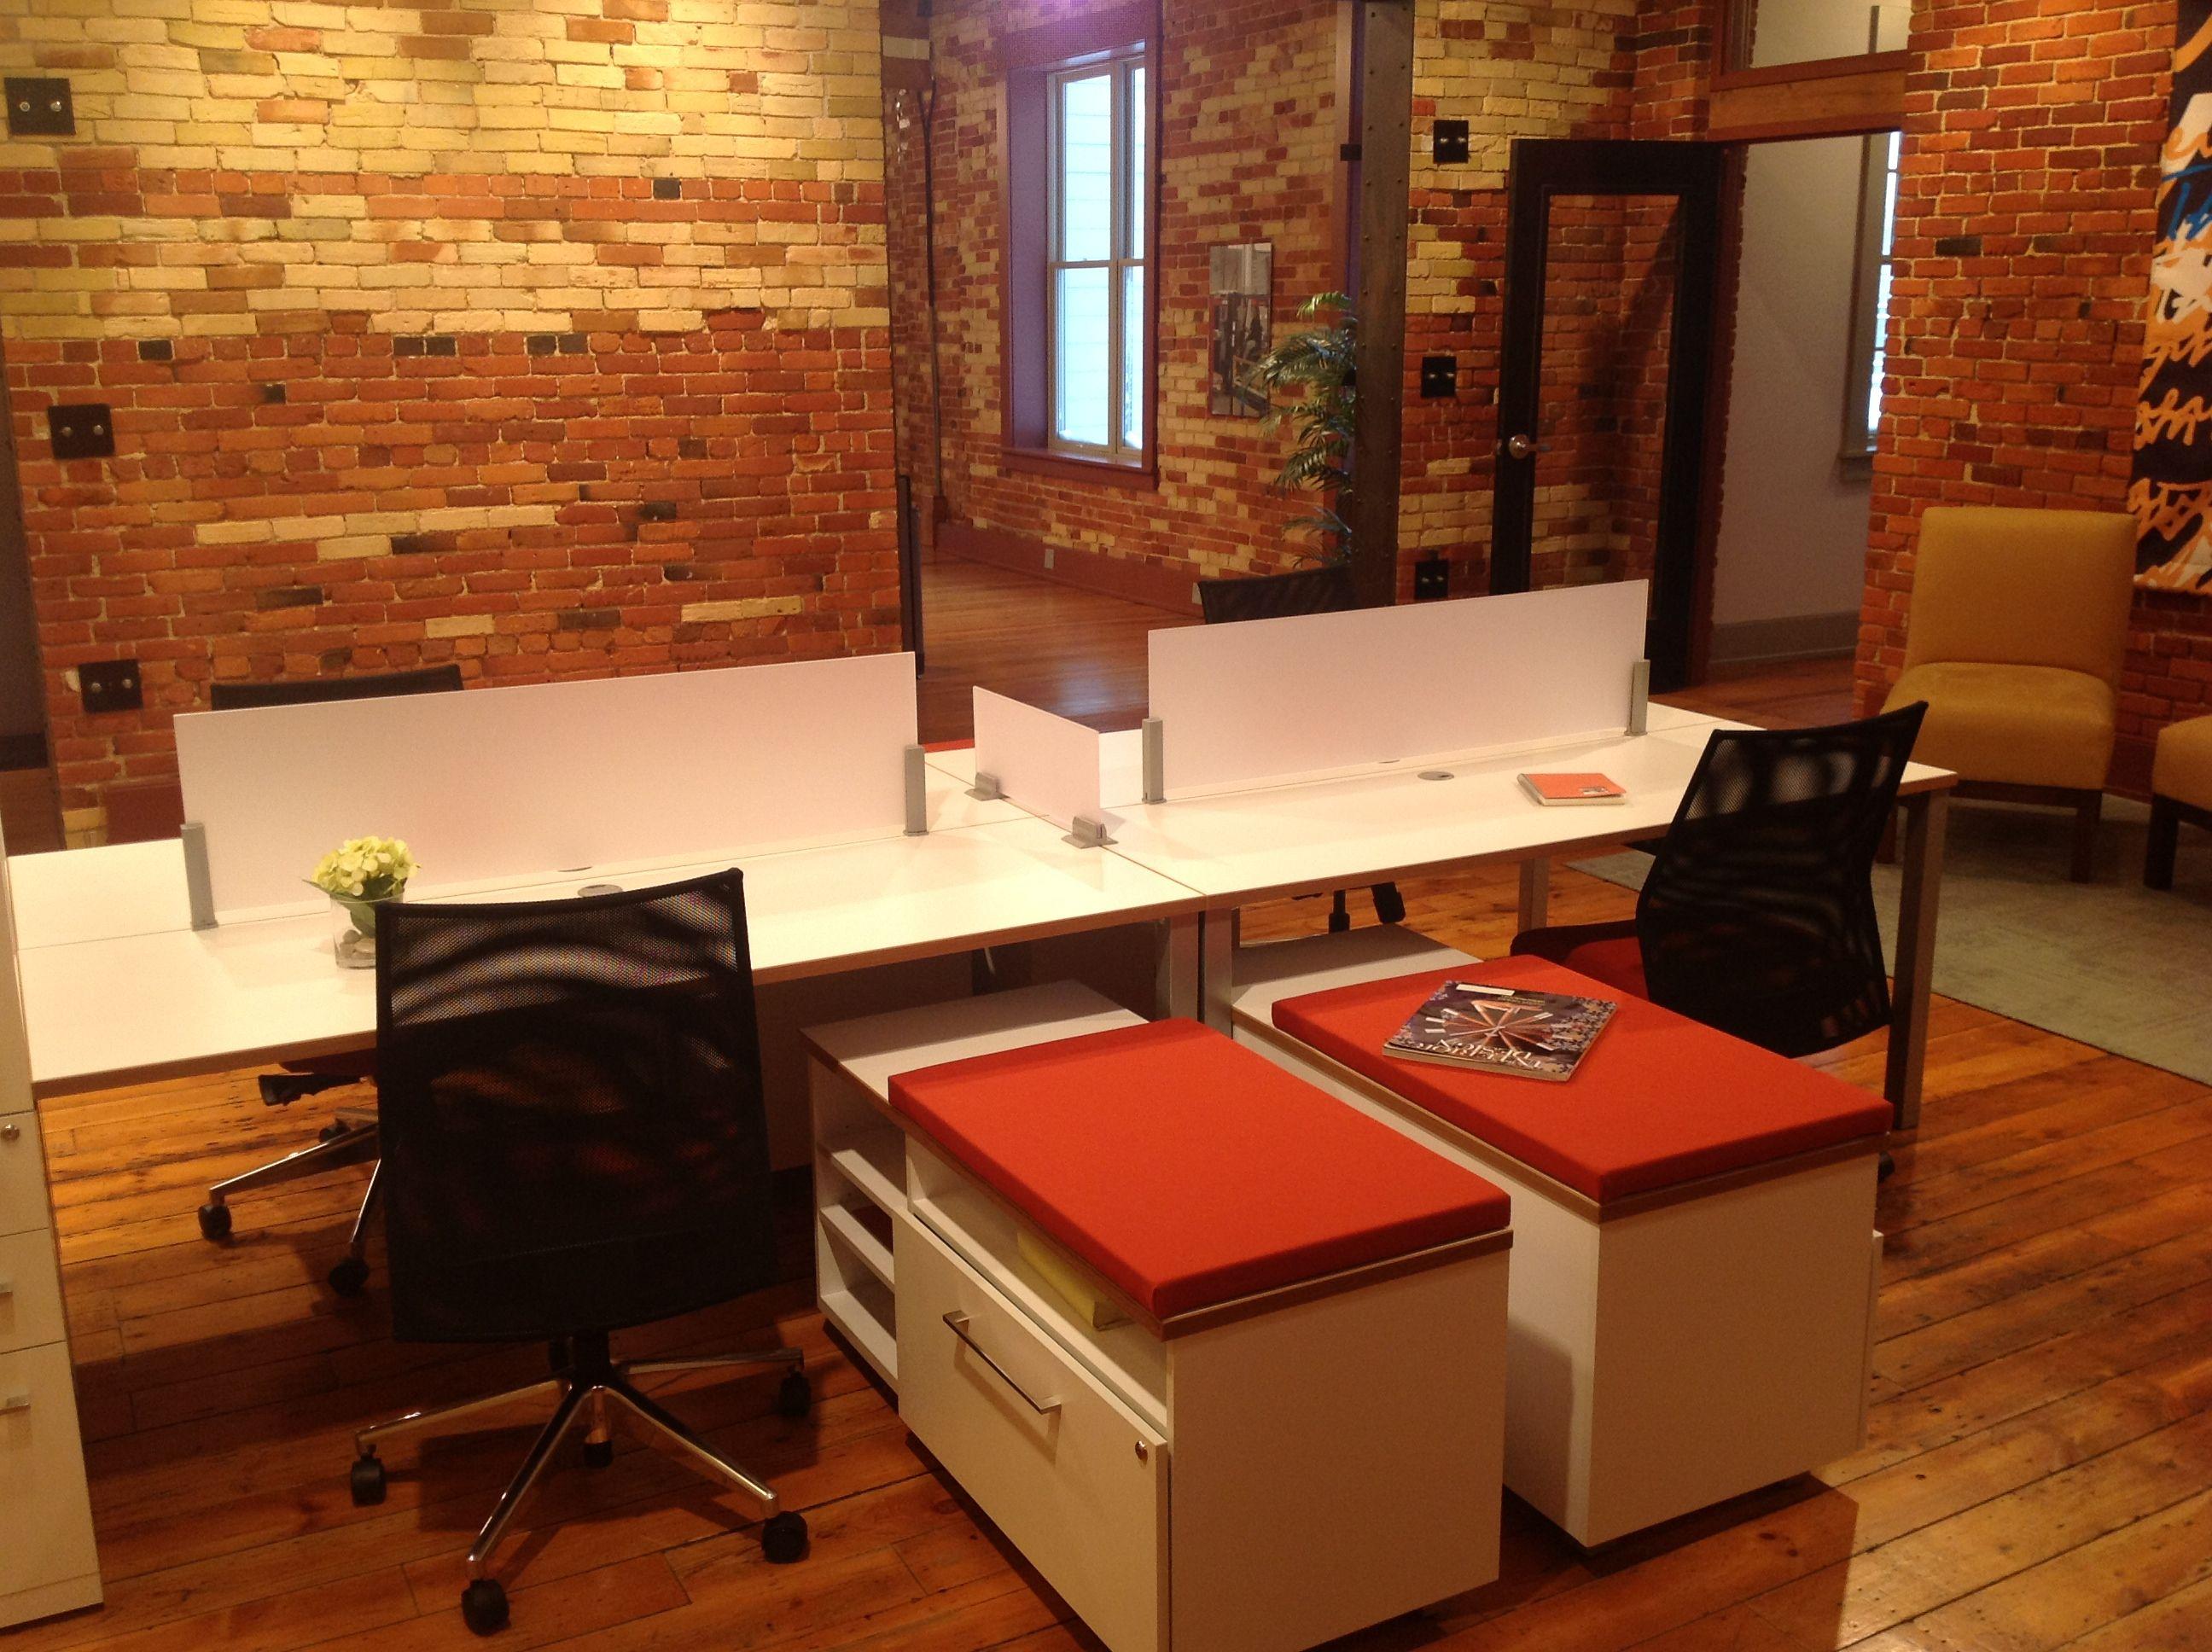 Trendway Furniture Offerings From FRI